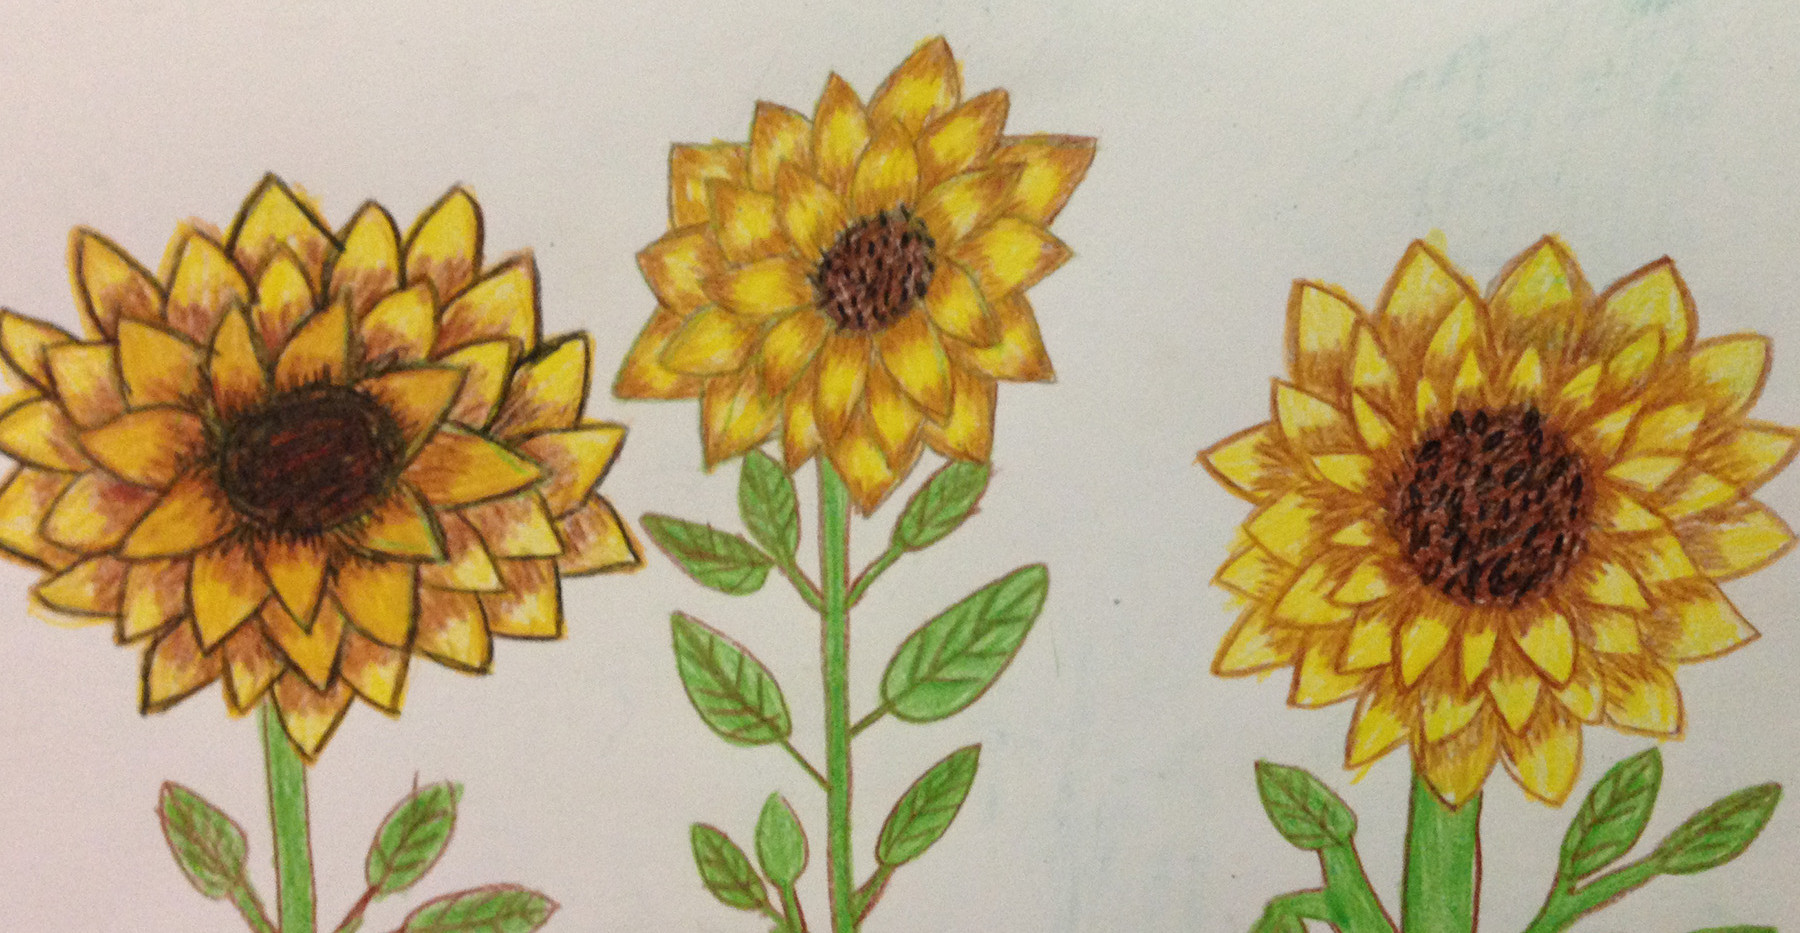 Zeyneb Johnson- Sunflowers